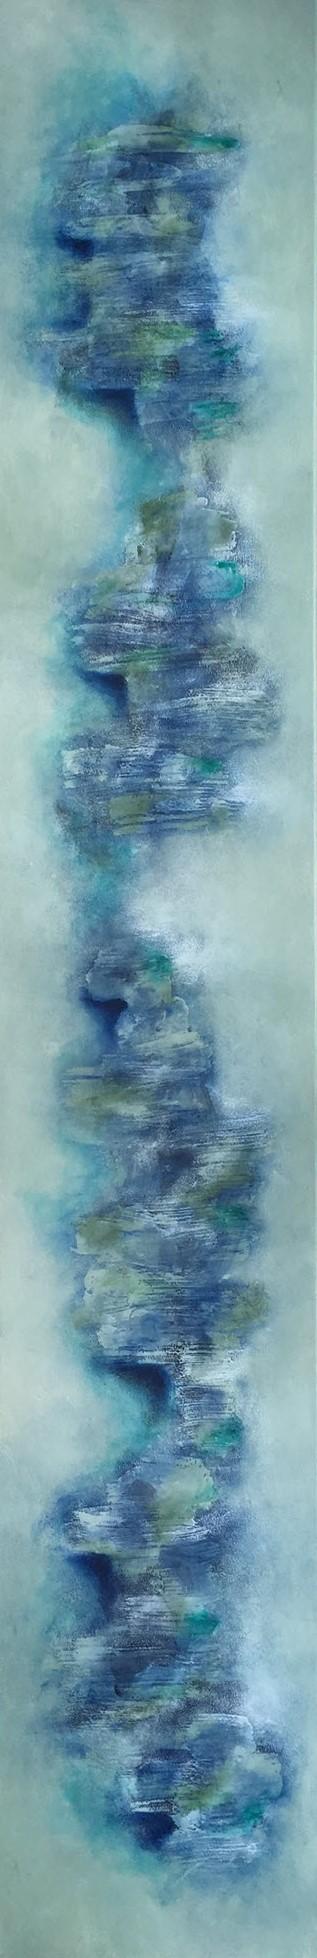 """Blue Twister"", 30 cm x 180 cm"